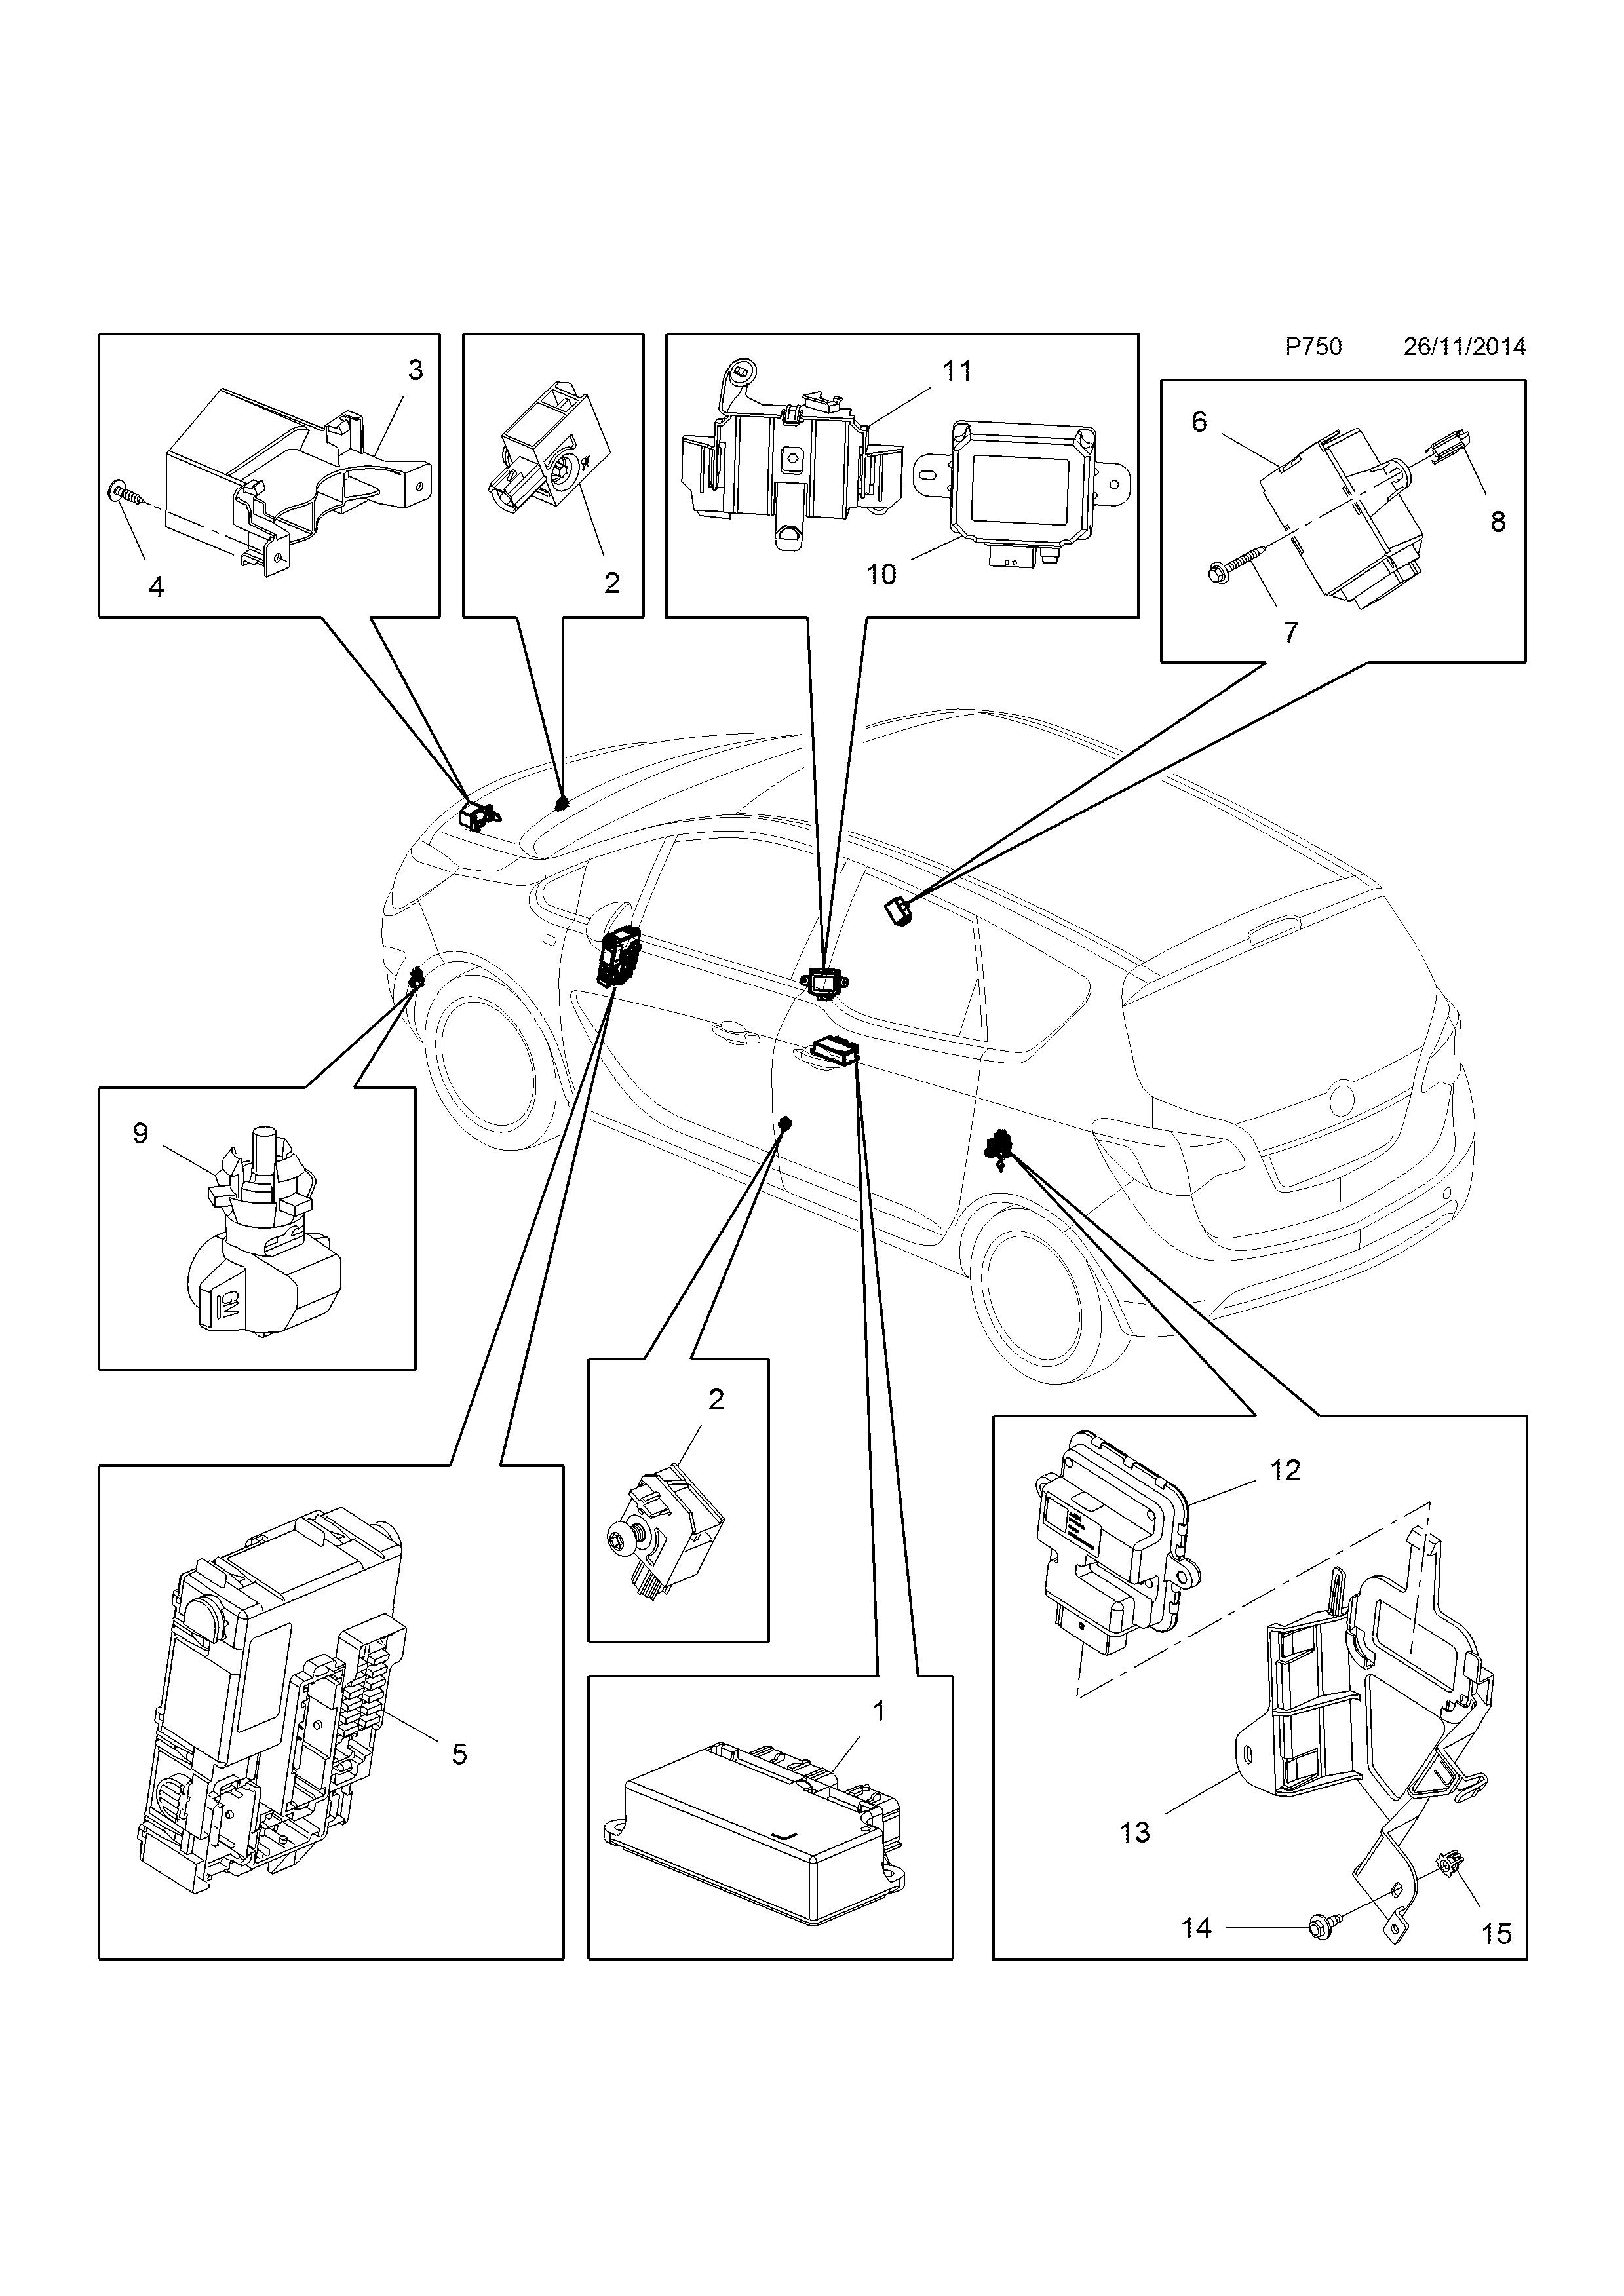 opel meriva b 2010 p electrical 11 body 15 b16dte lwq 2015 Opel Vectra list of parts